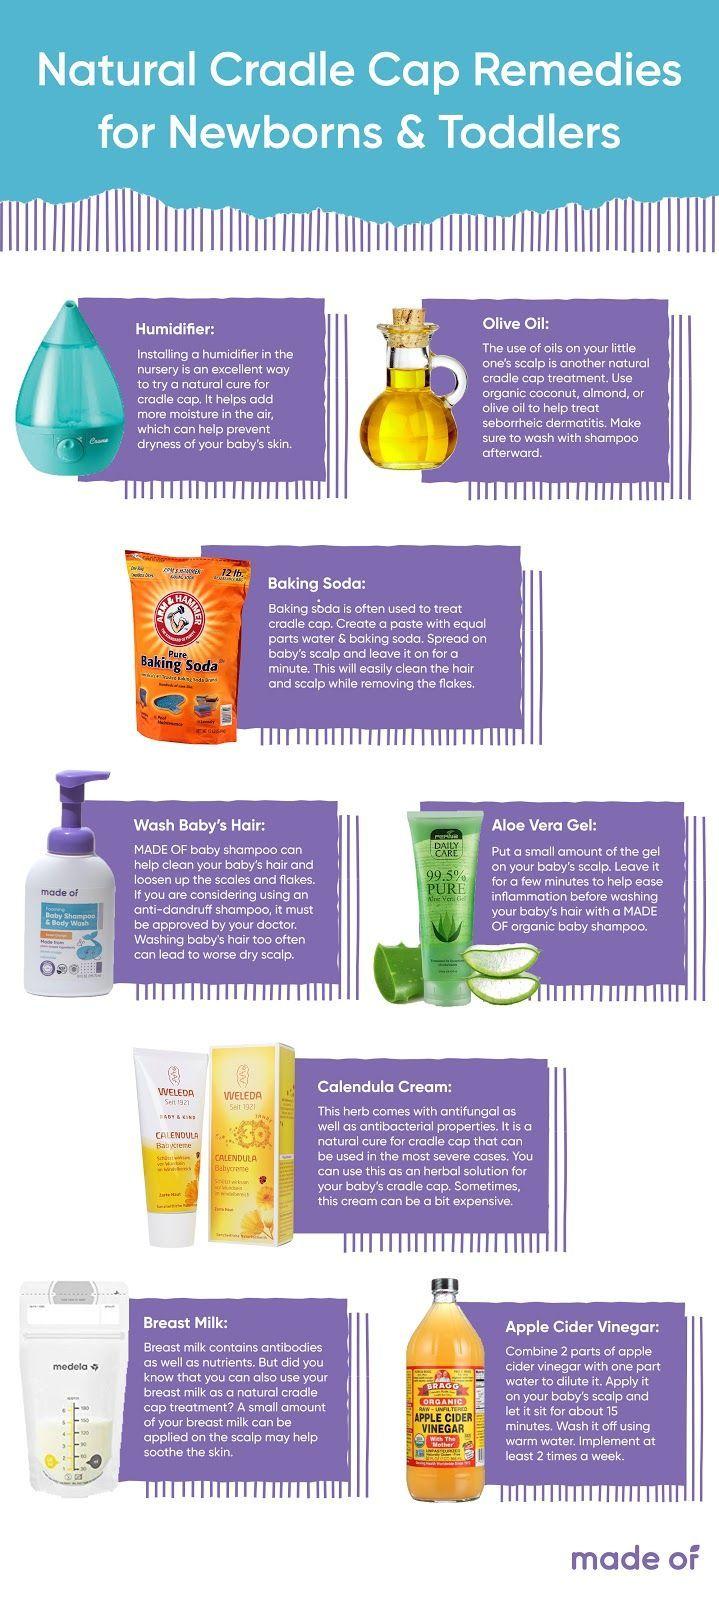 Natural Remedies For Cradle Cap On Newborns Toddlers Made Of Cradle Cap Remedies Baby Cradle Cap Baby Remedies